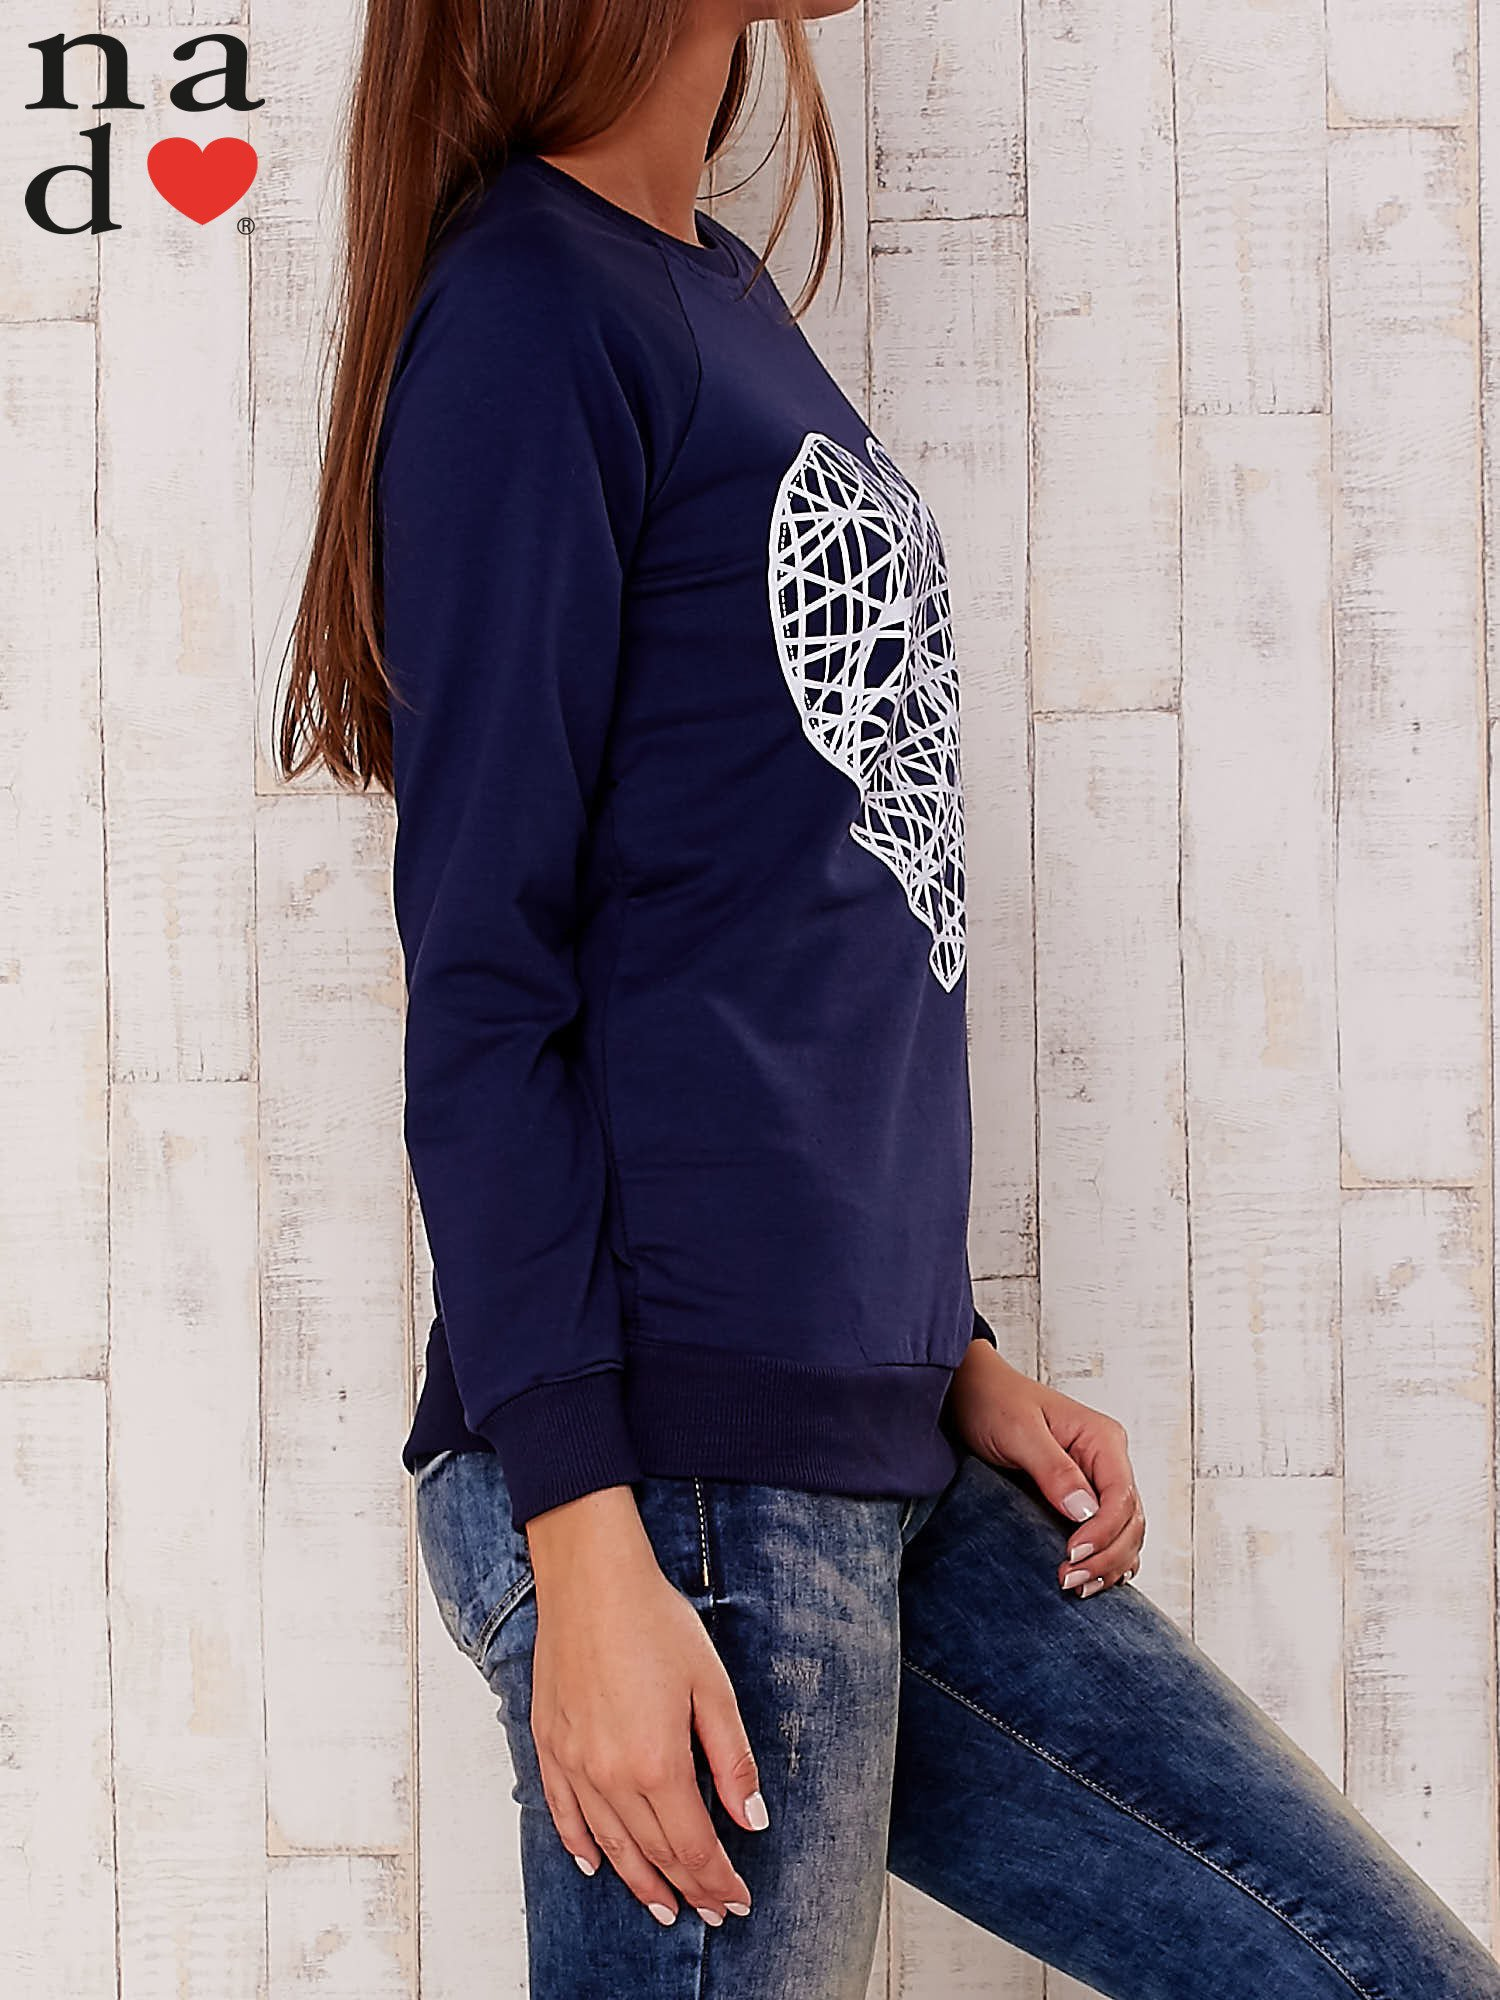 Ciemnoniebieska bluza z nadrukiem serca                                  zdj.                                  3